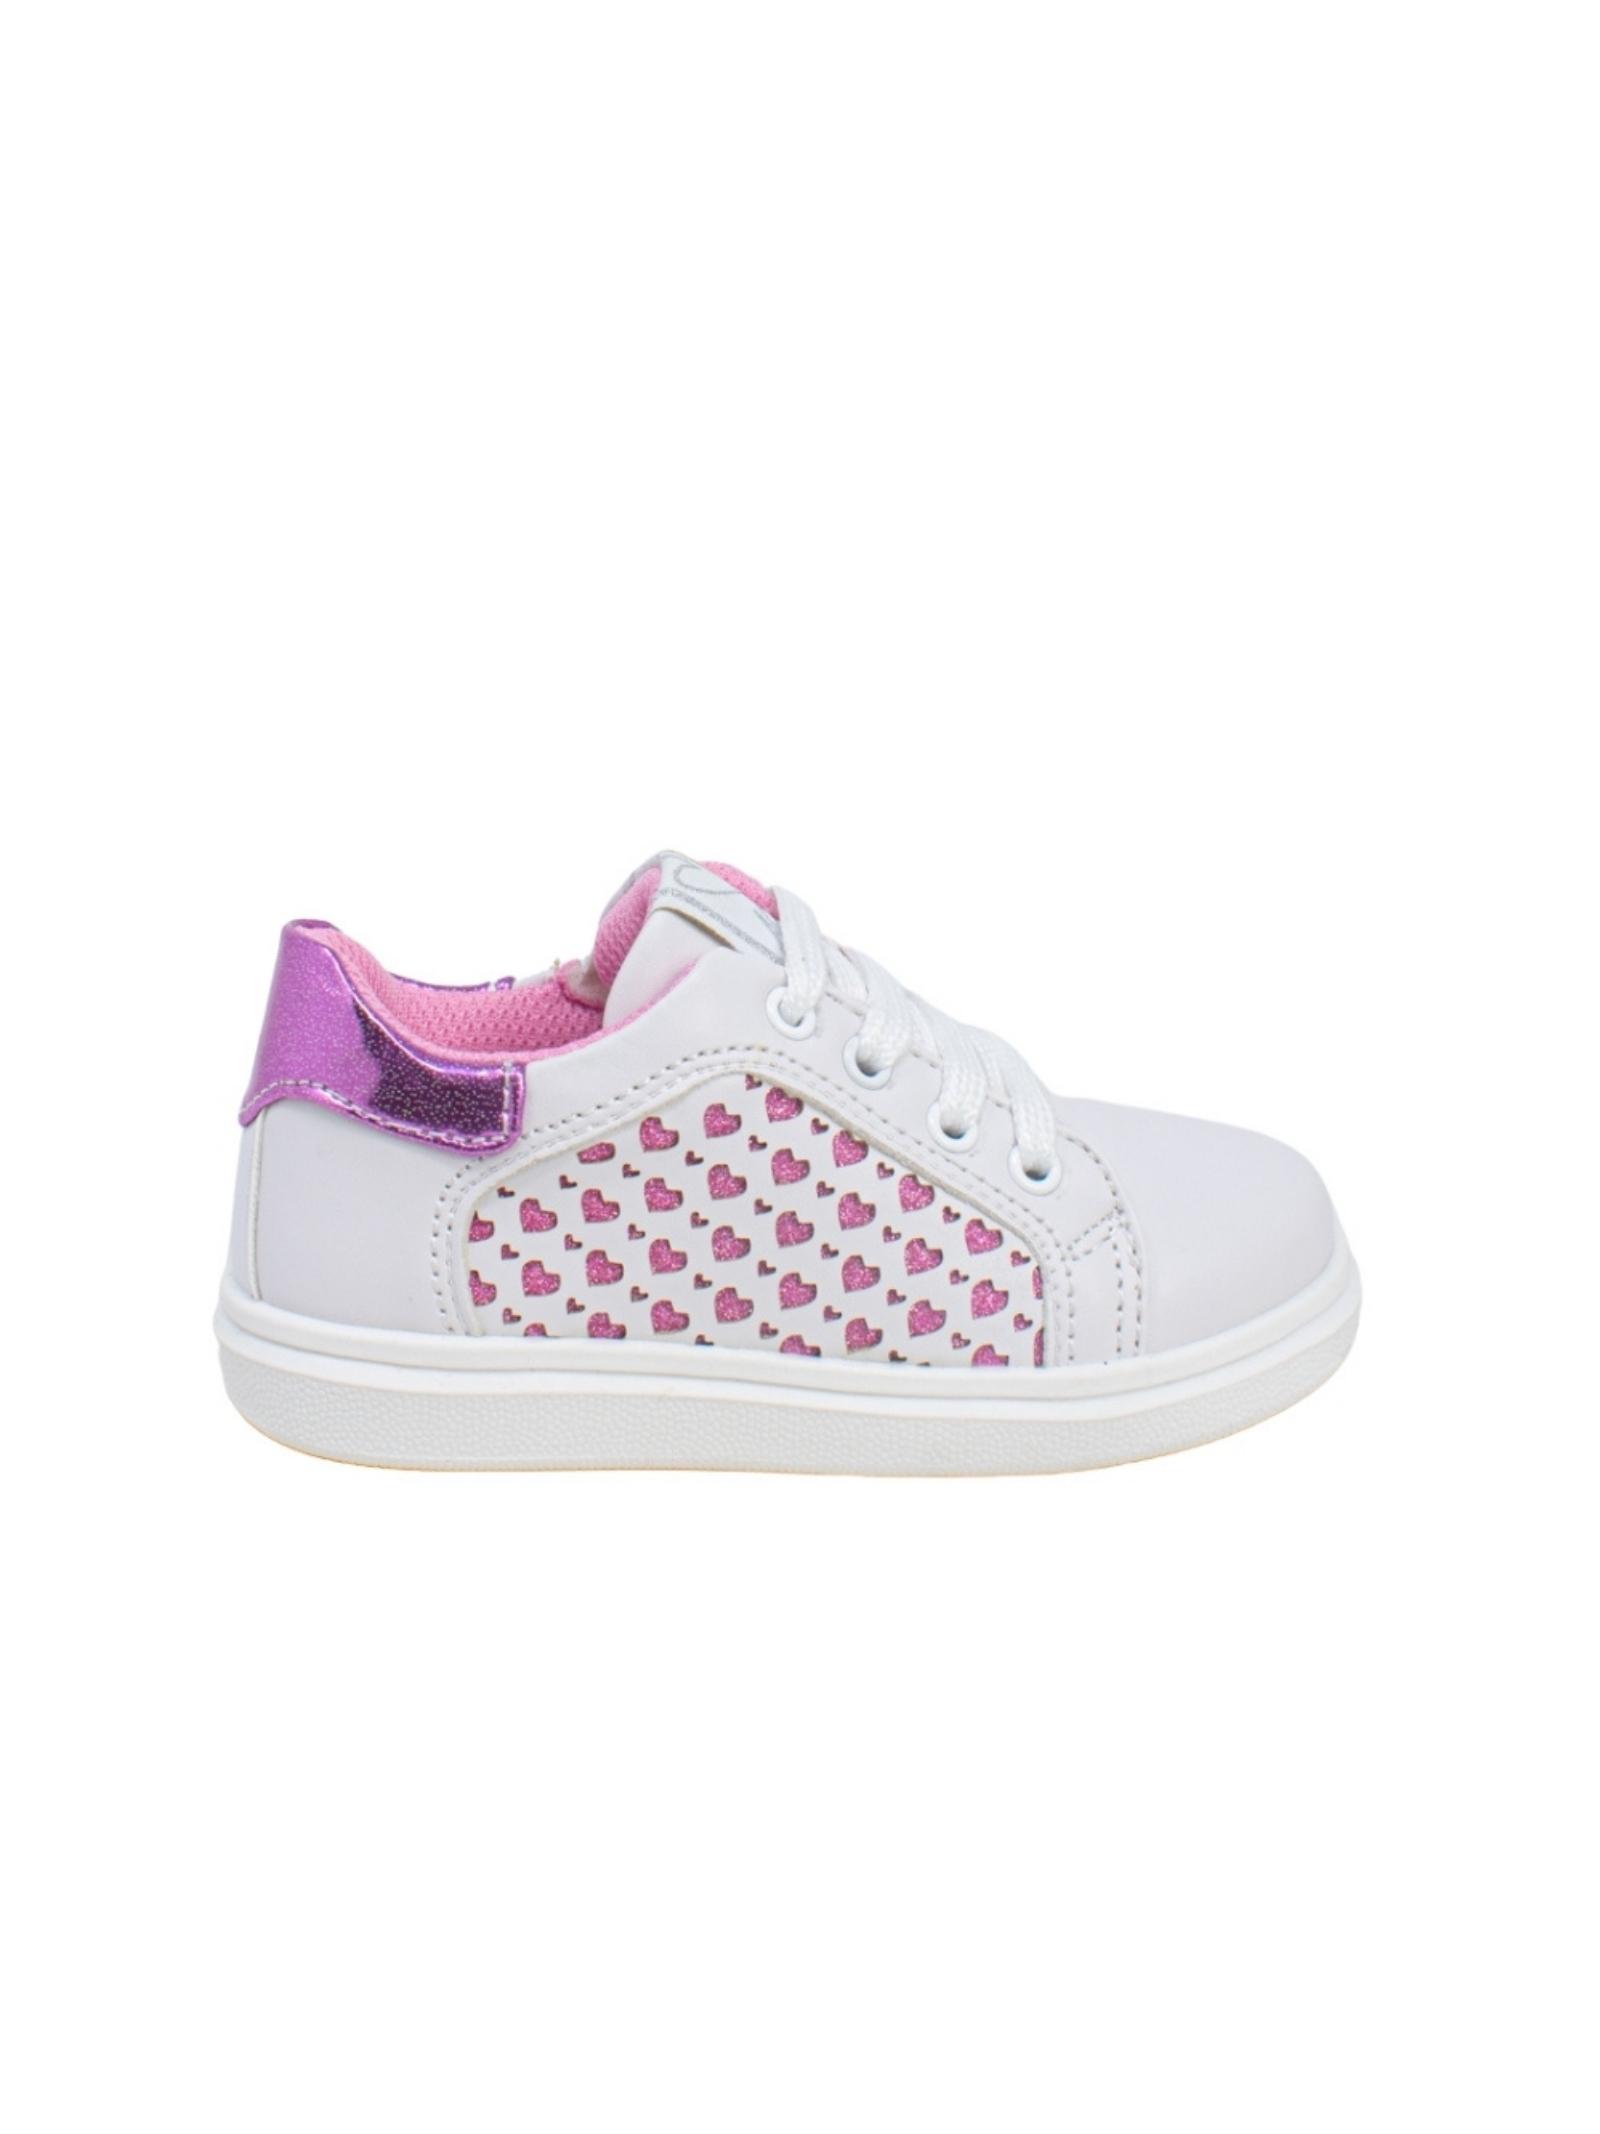 Sneakers Love Glitter ASSO | Sneakers | 10381BIANCO